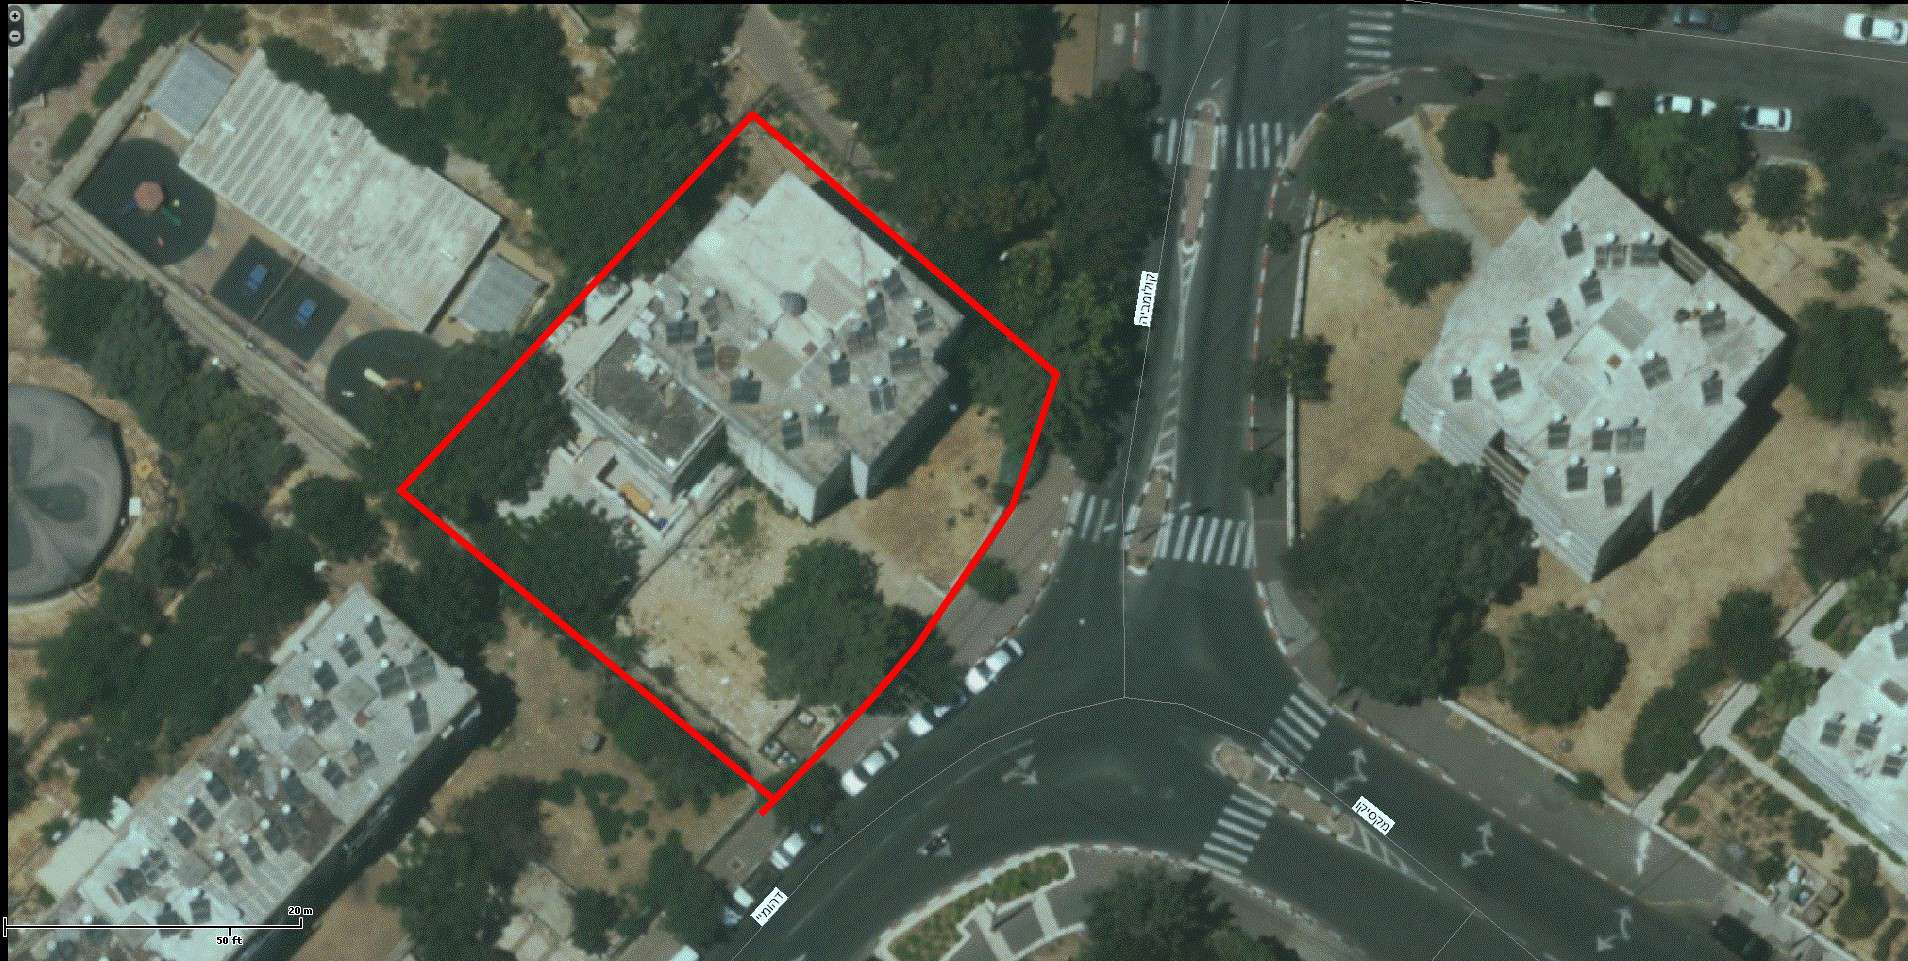 TAMA 38 project in Jerusalem – Dehomey 2 – GIS